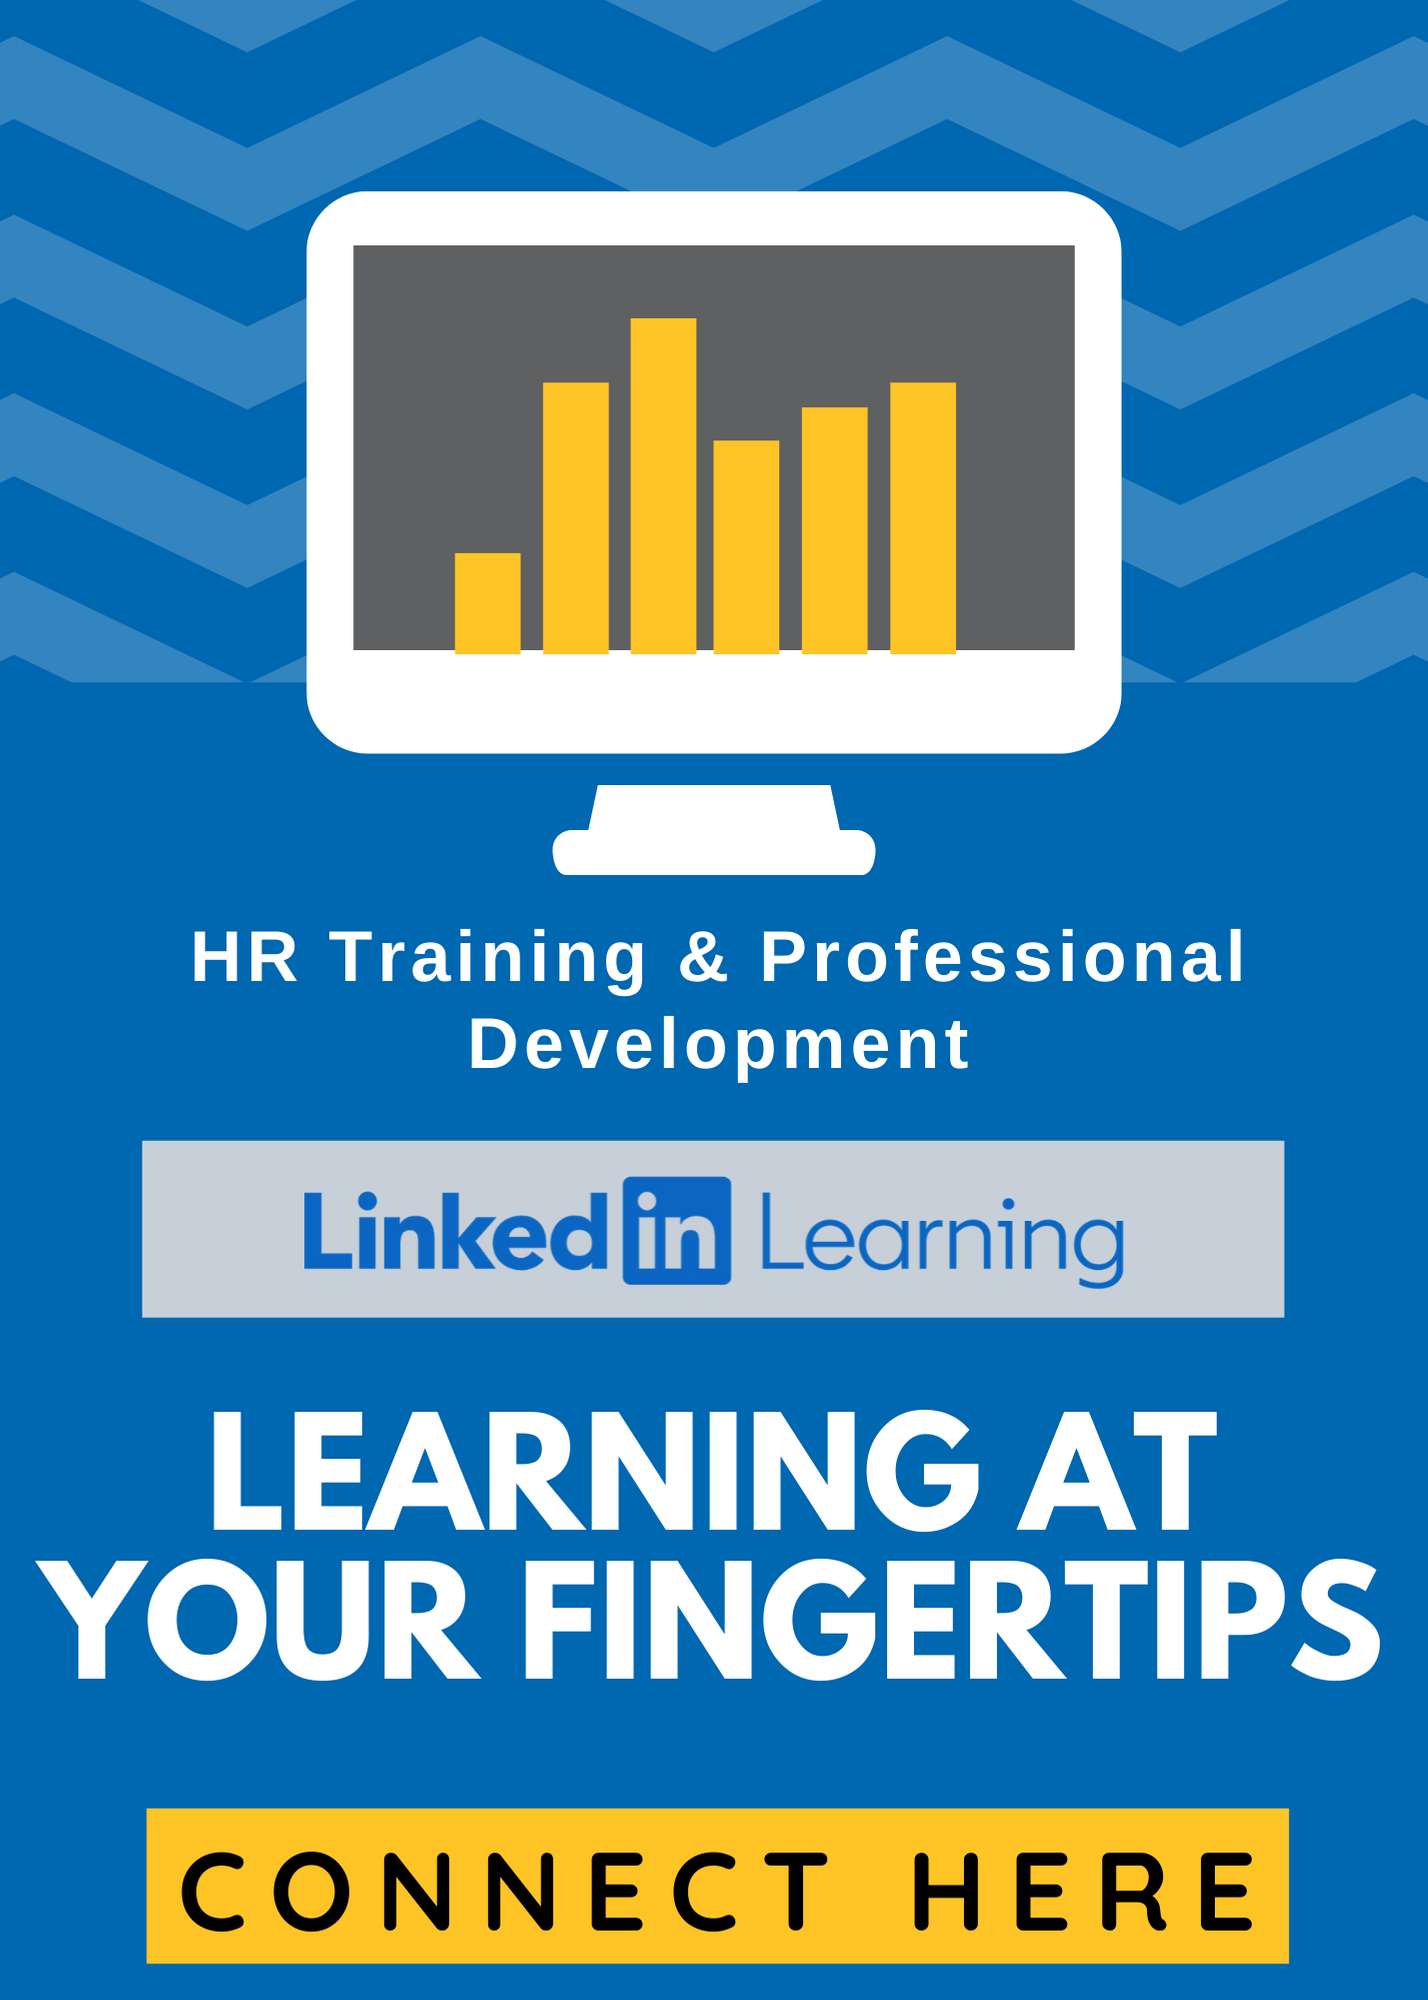 HR Online Professional Development through LinkedIn Learning